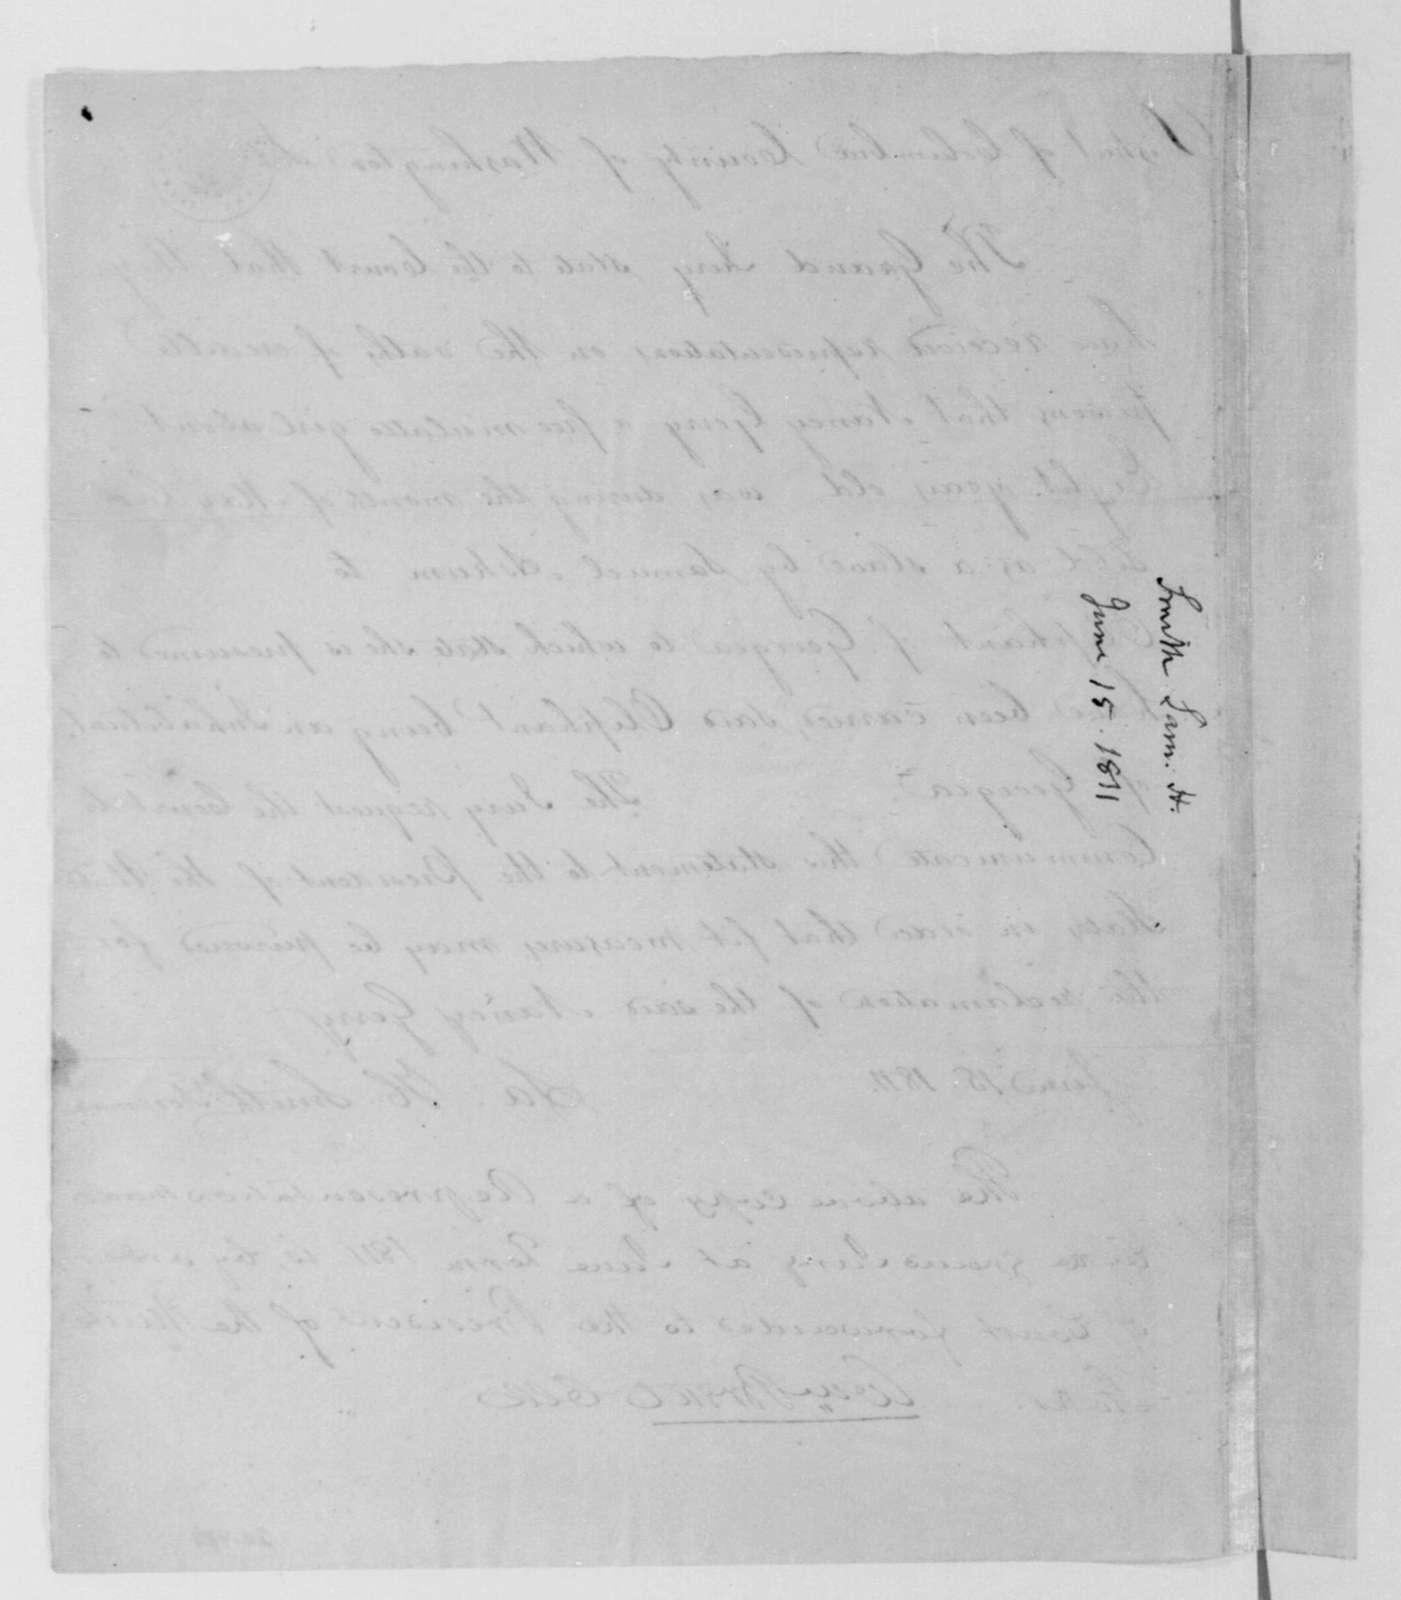 Samuel Smith to Washington D. C. Criminal Court, June 15, 1811. Representation.